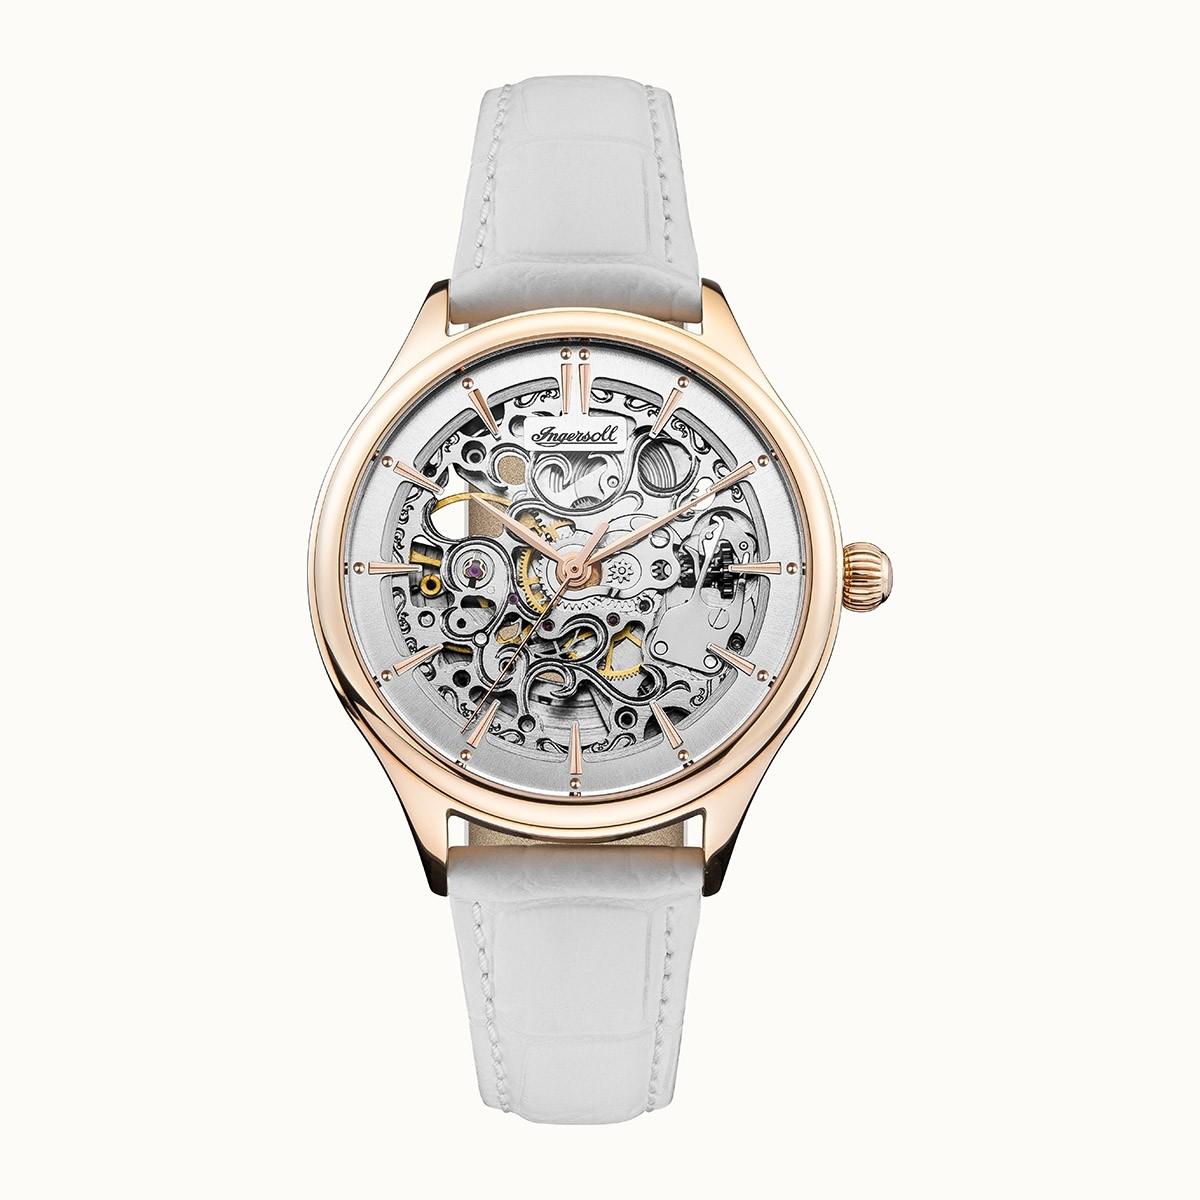 39a6d14da5c Ingersoll THE VICKERS AUTOMATIC I06301 – Pohanka   co. – hodinky a ...